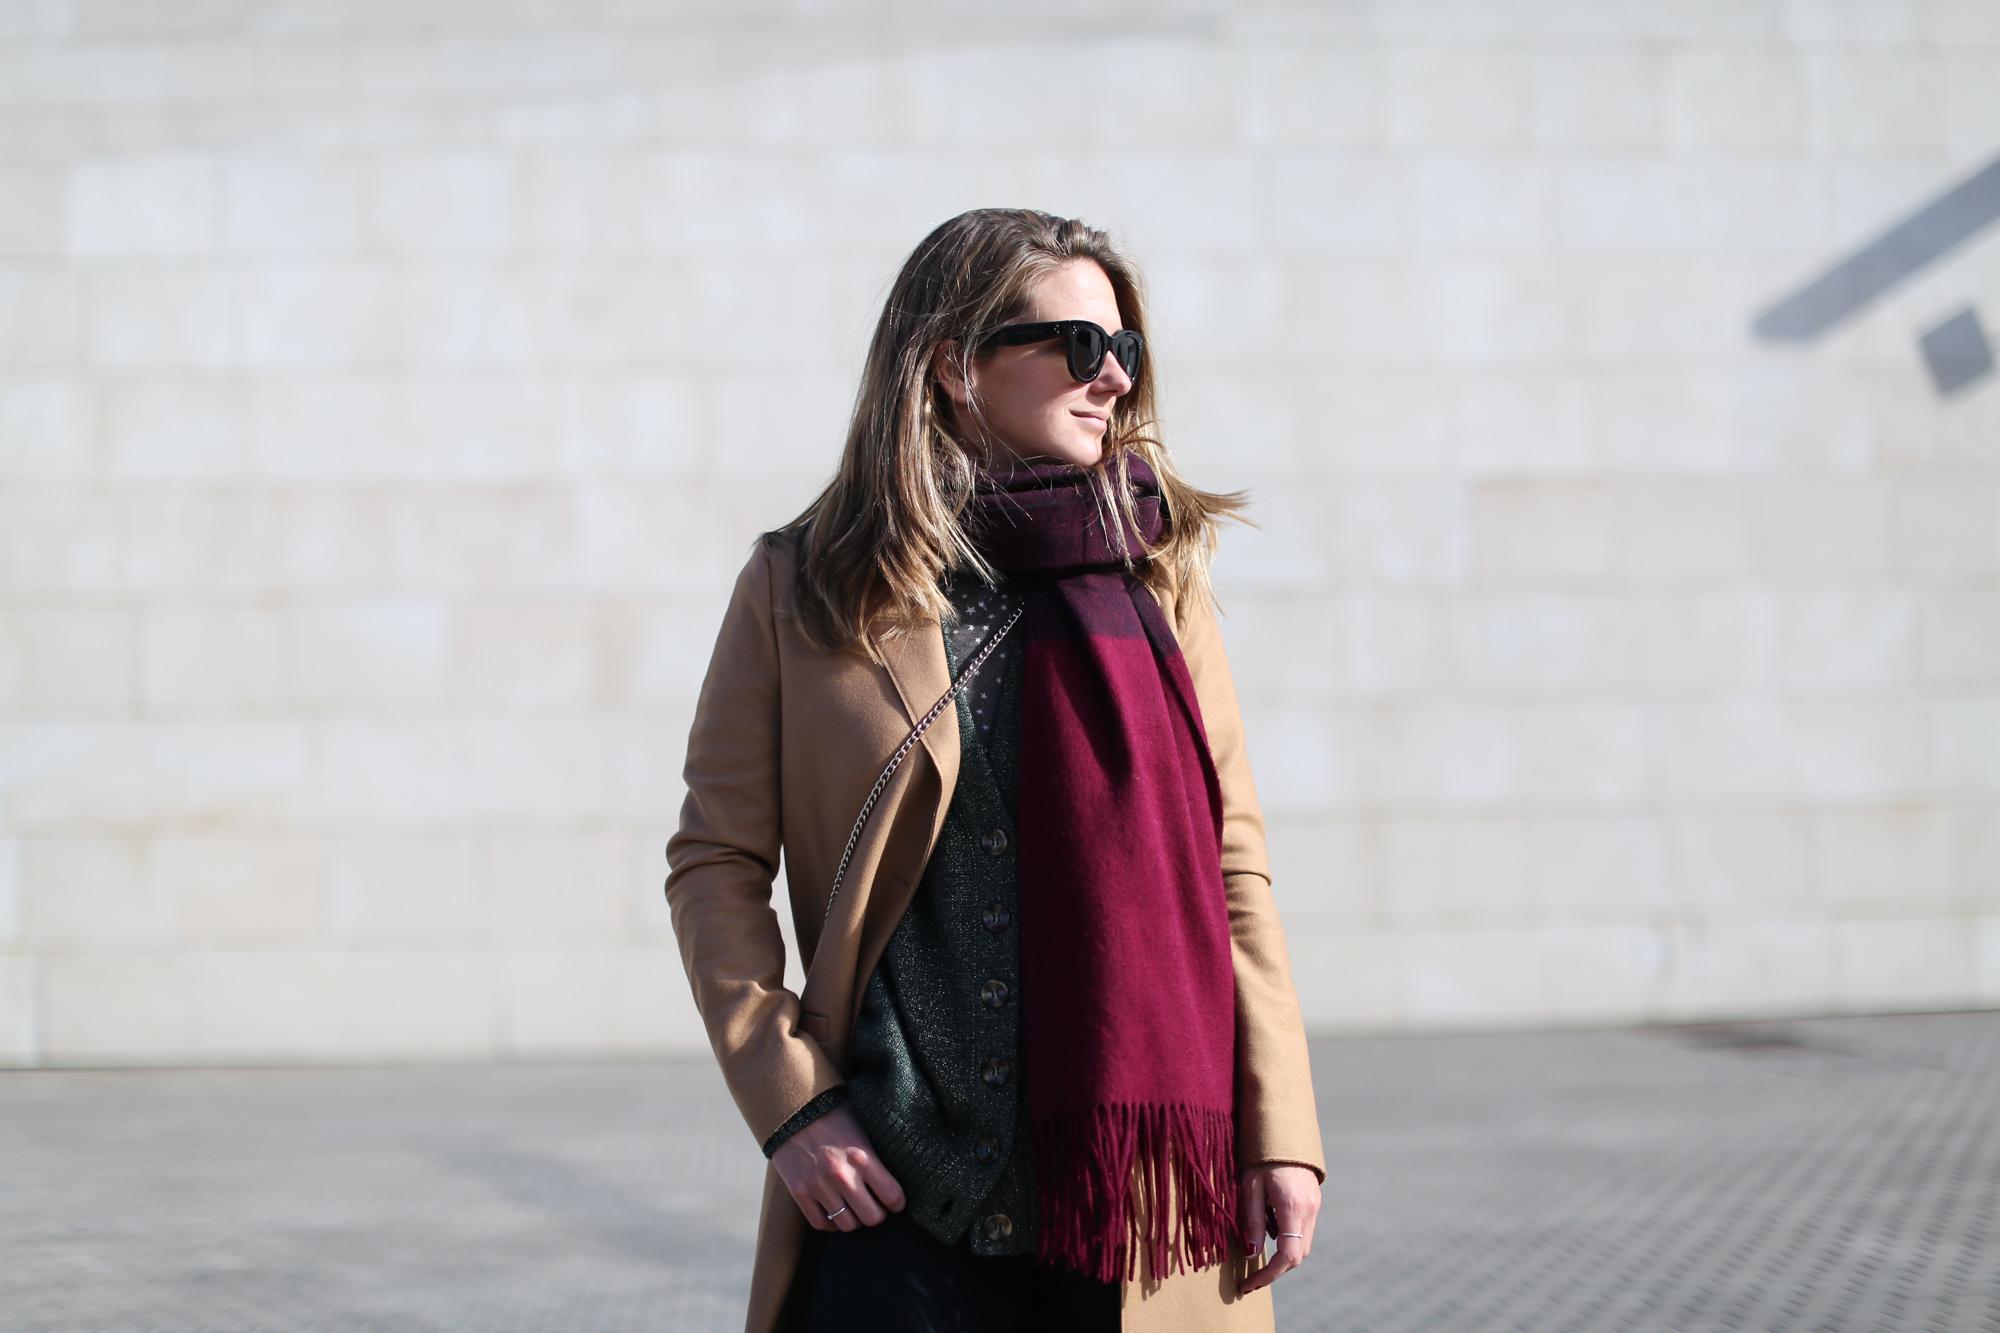 Clochet_streestyle_fashionblogger_&otherstories_abrigocamel_nikepegasus_topshopjamiejeans-5